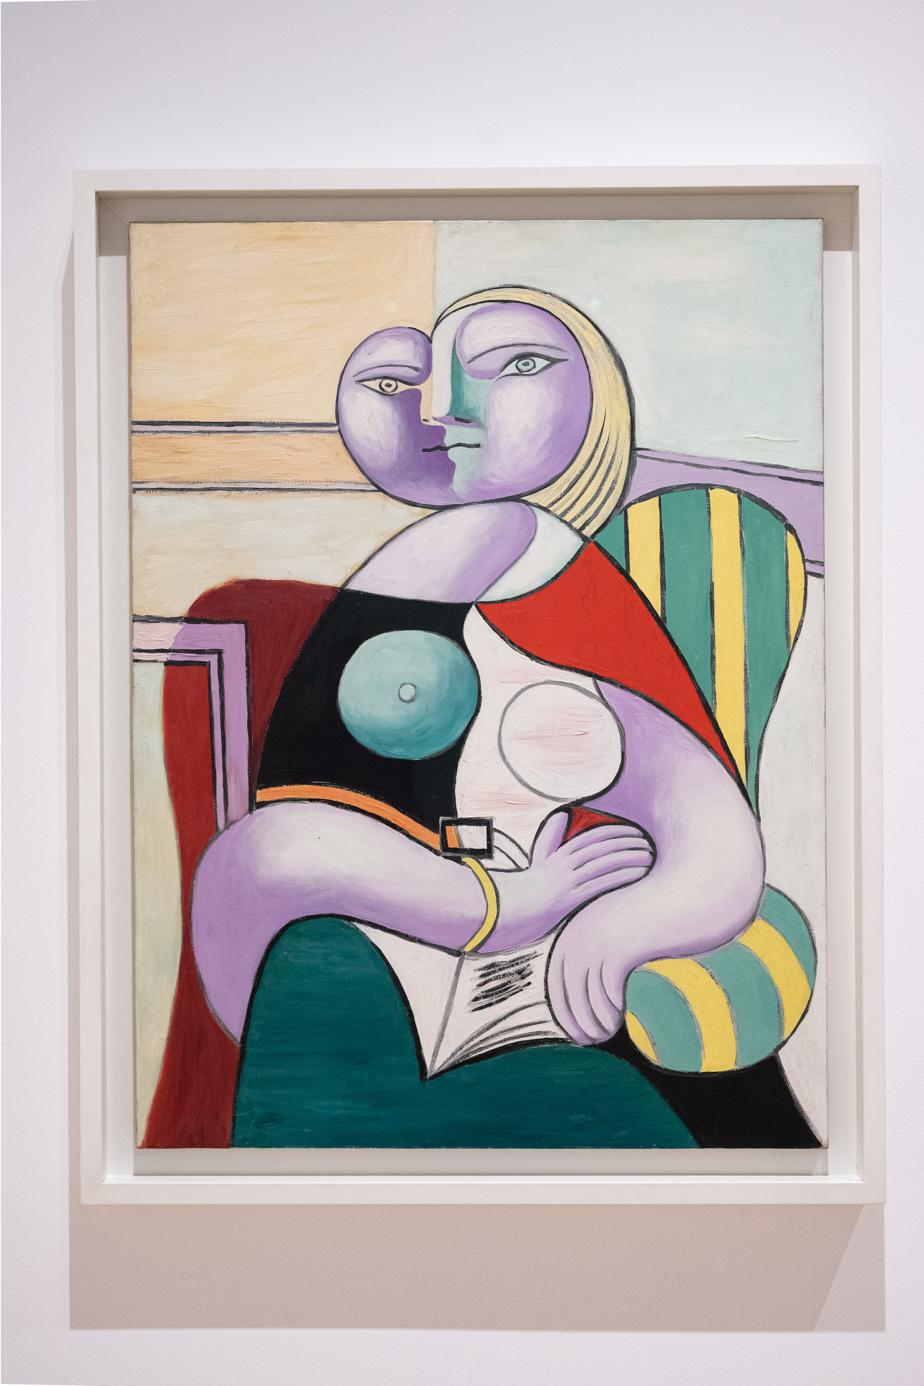 La lecture, 1932, Pablo Picasso, huile sur toile, 130 x 97,5cm